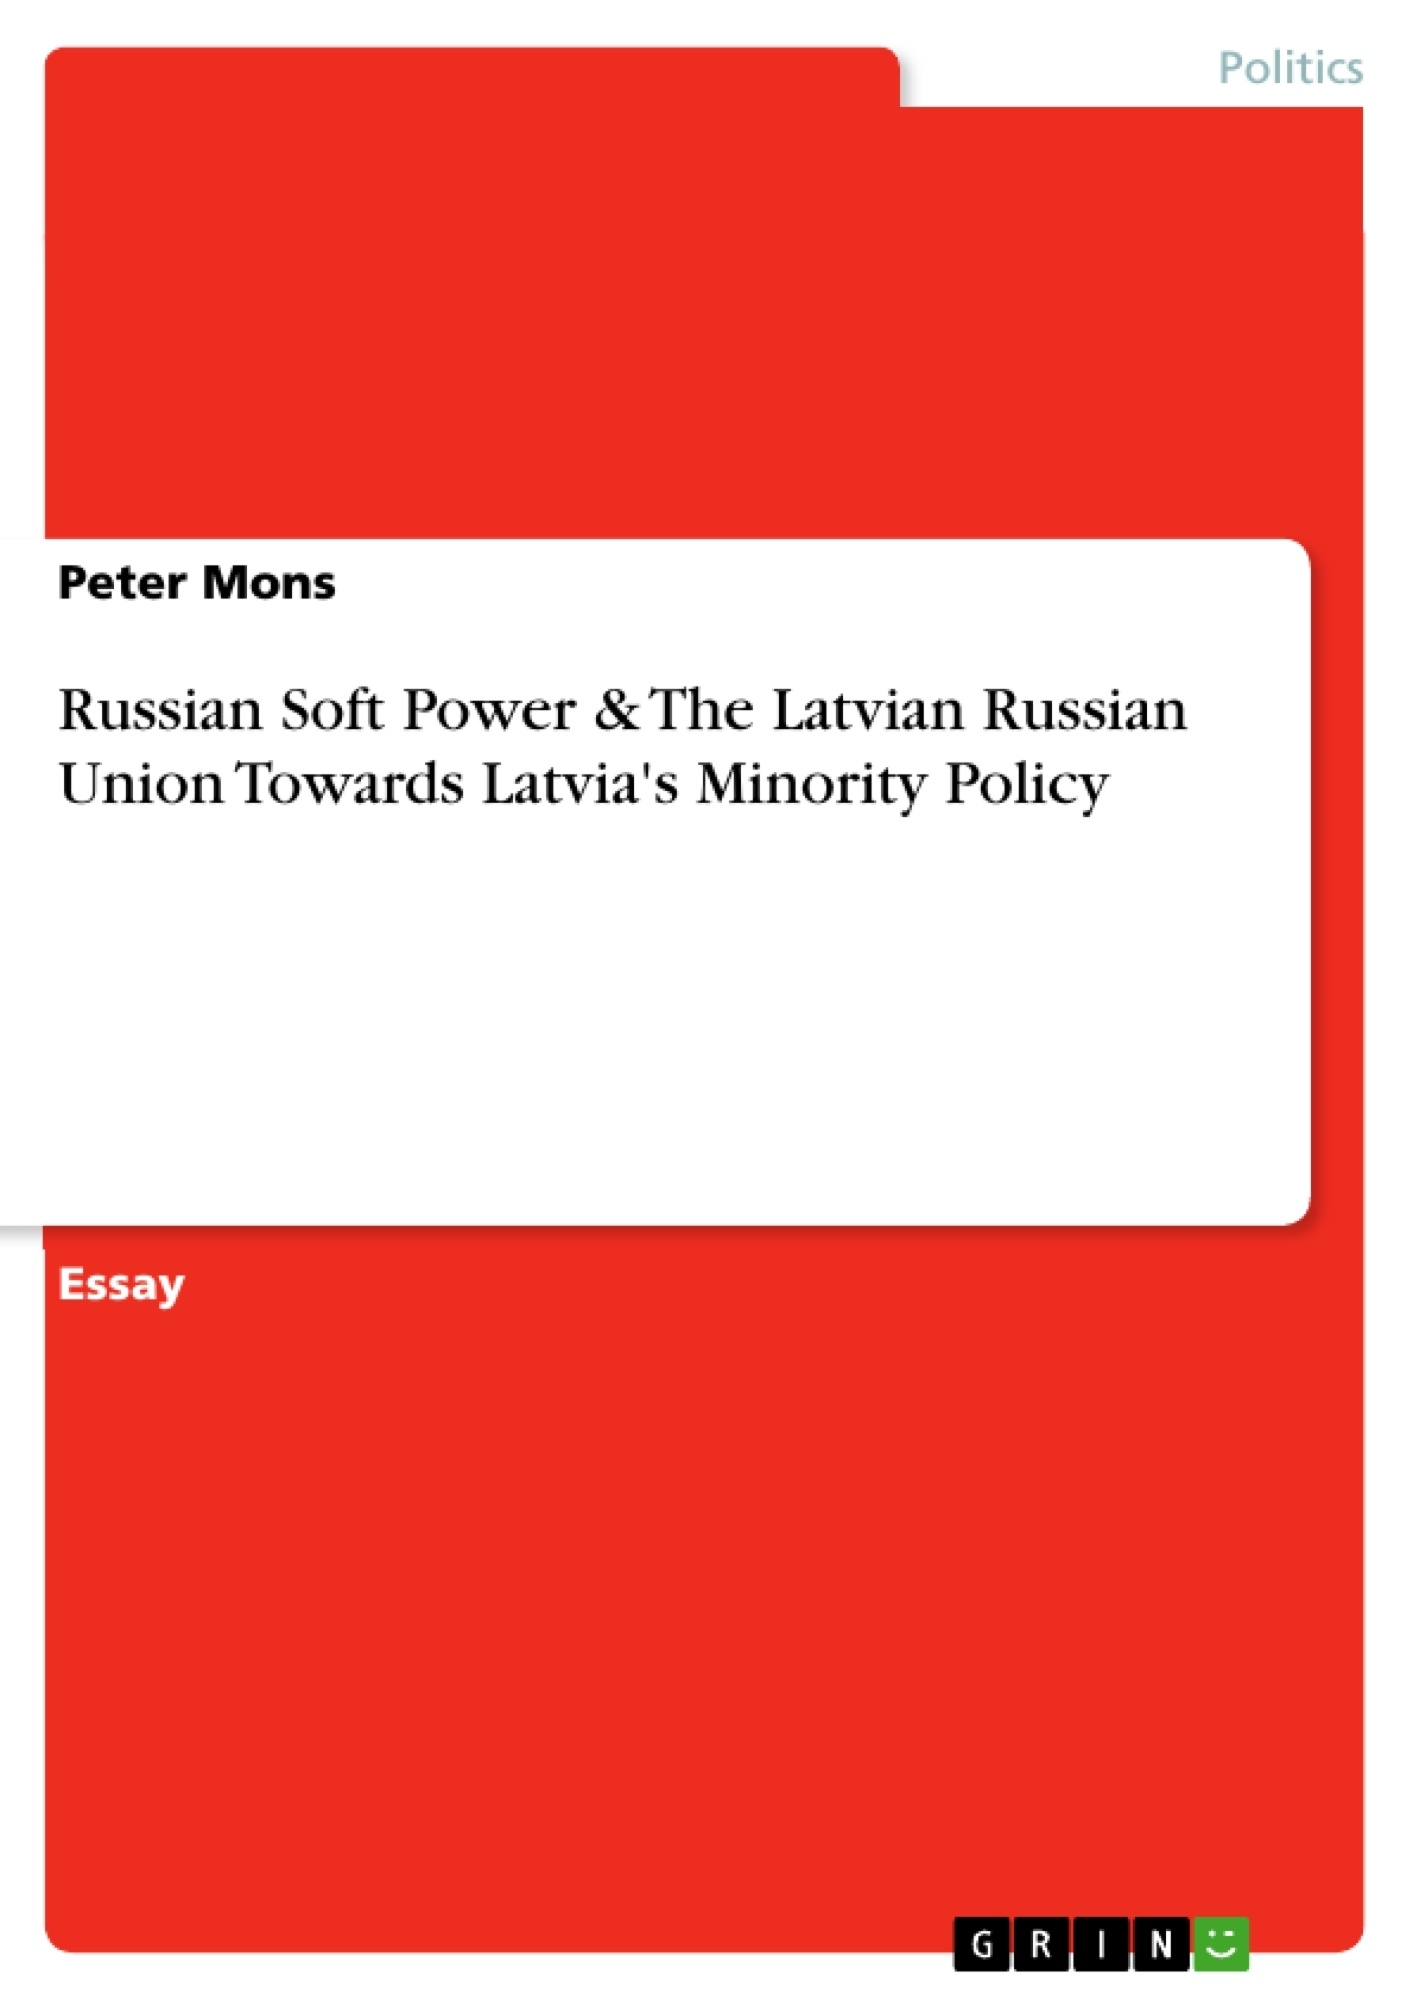 Title: Russian Soft Power & The Latvian Russian Union Towards Latvia's Minority Policy